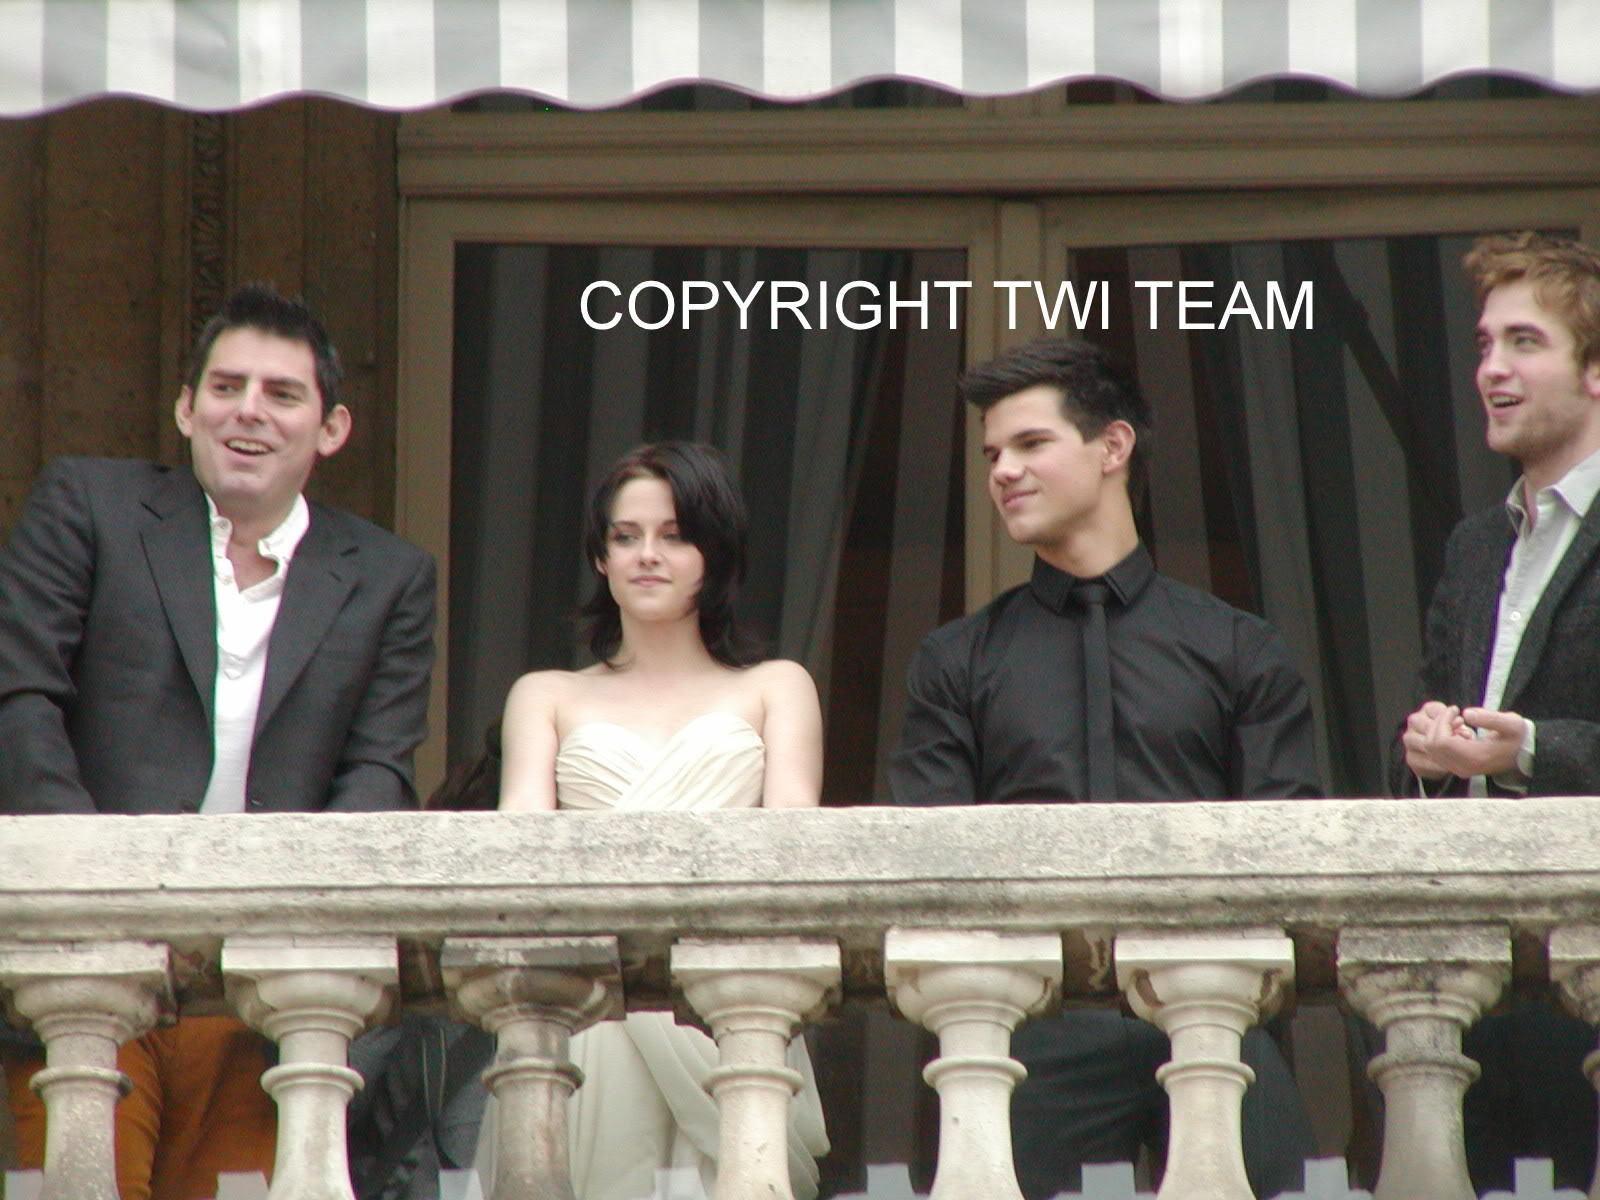 New/Old Pics Of Robert, Kristen, And Taylor In Paris November 2009